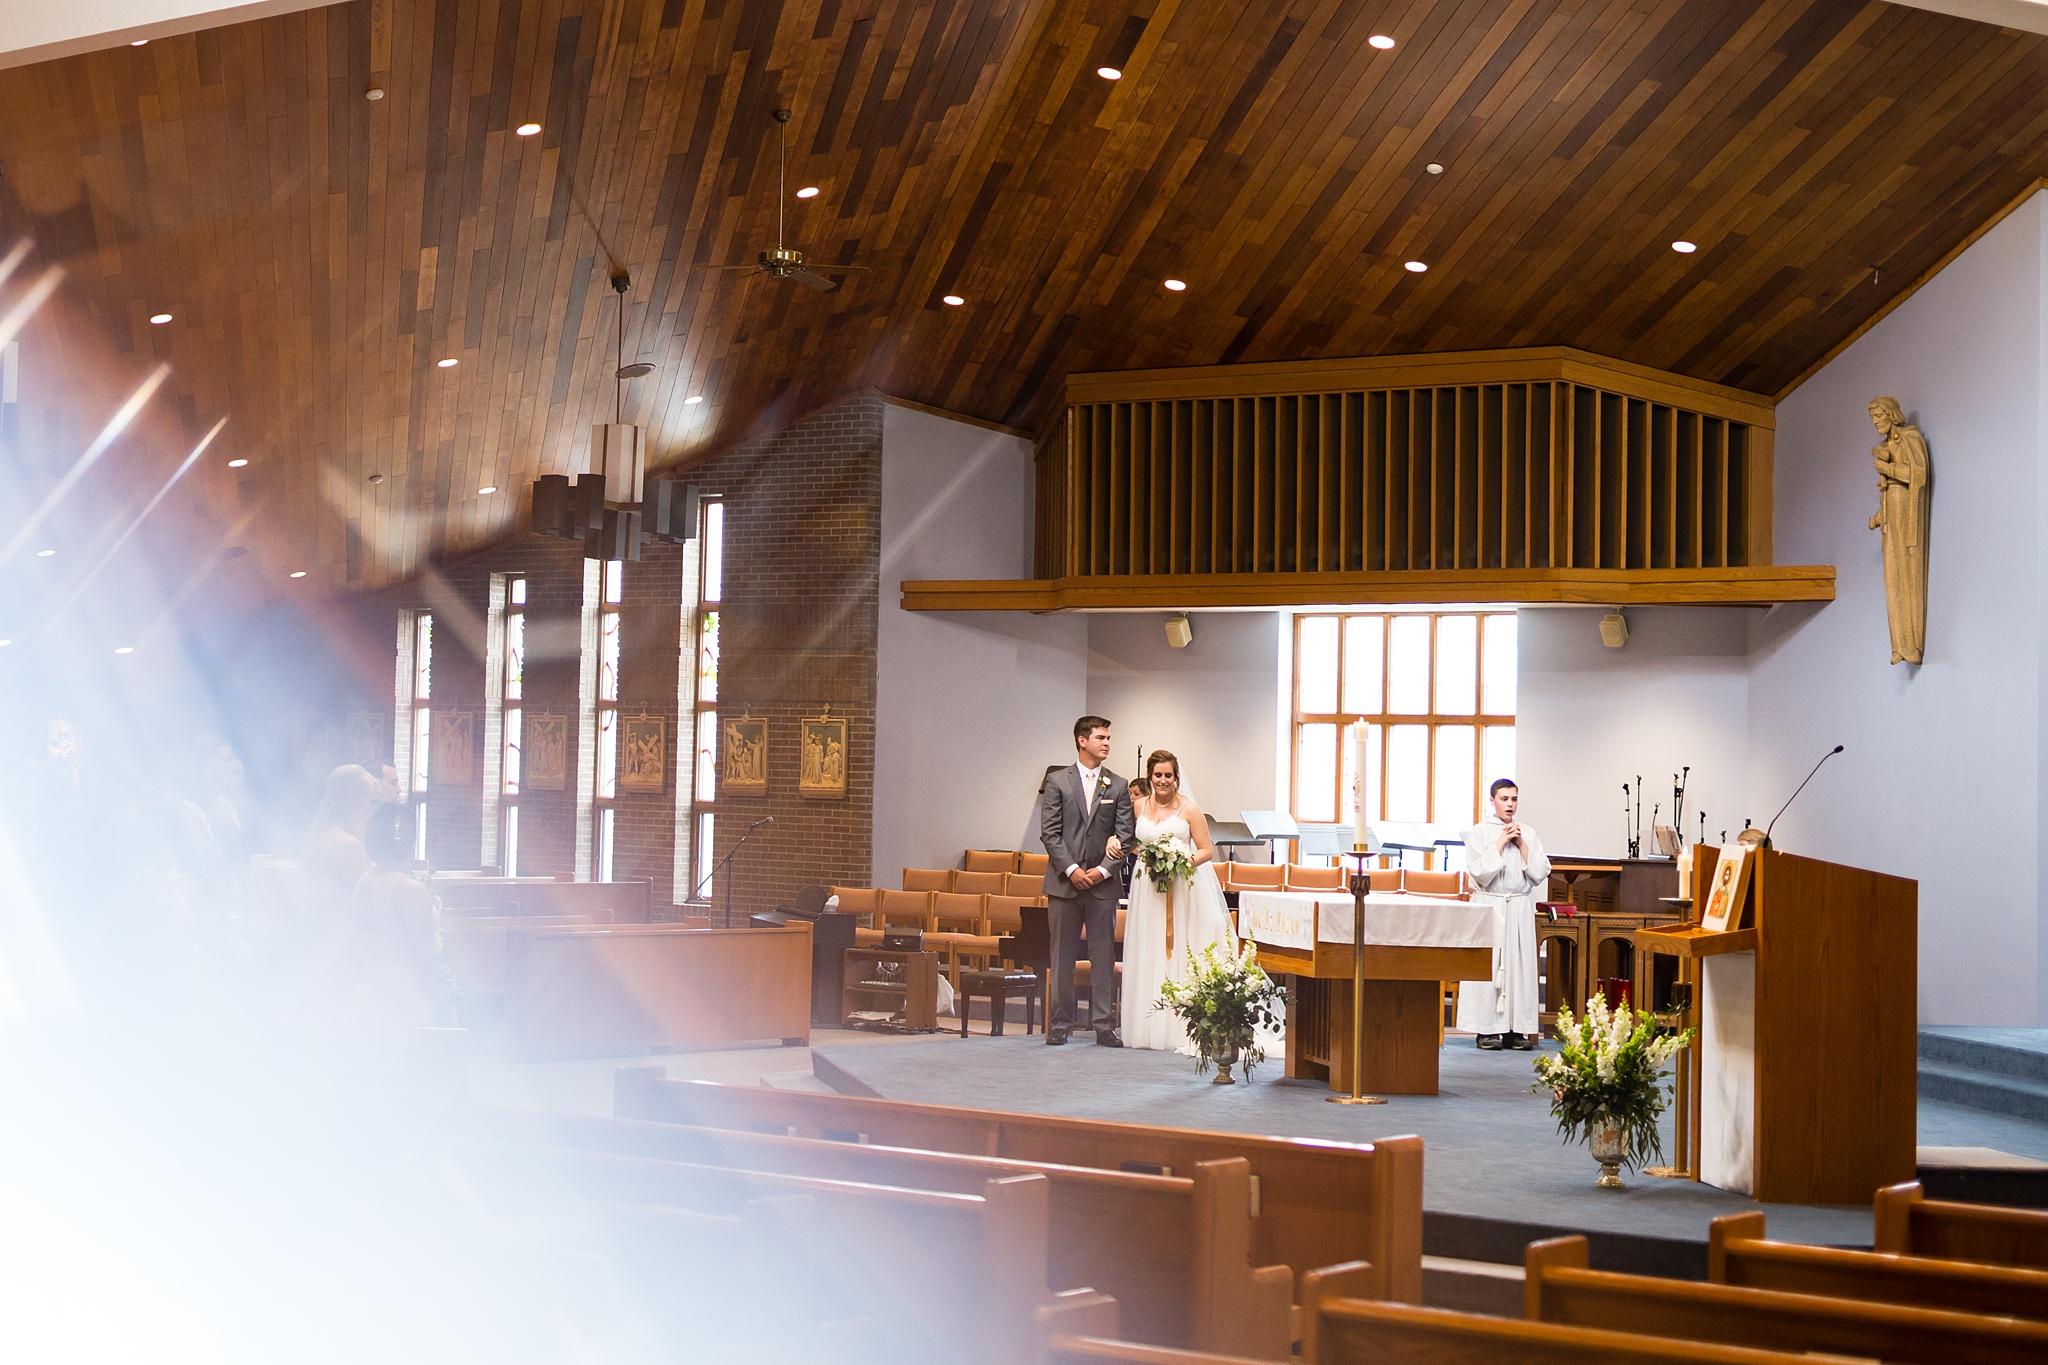 Meghan_Drew_Grand_Rapids_Cheney_place_Wedding051.JPG